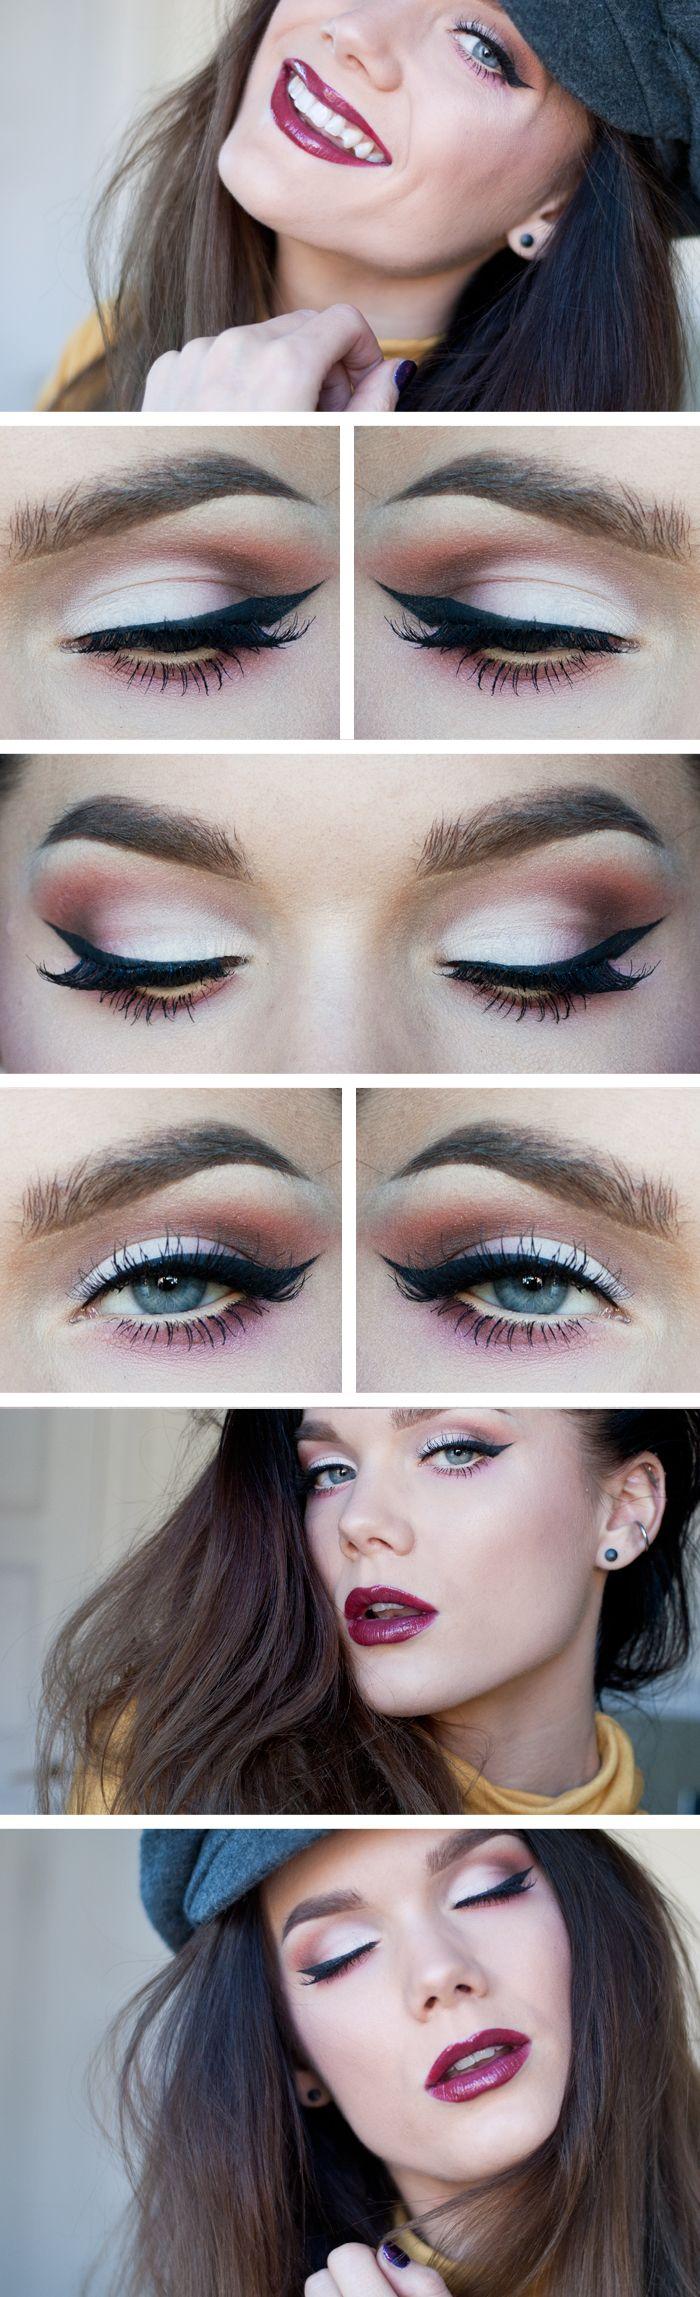 Pin by jessica schaufert on beauty pinterest summer eyes linda